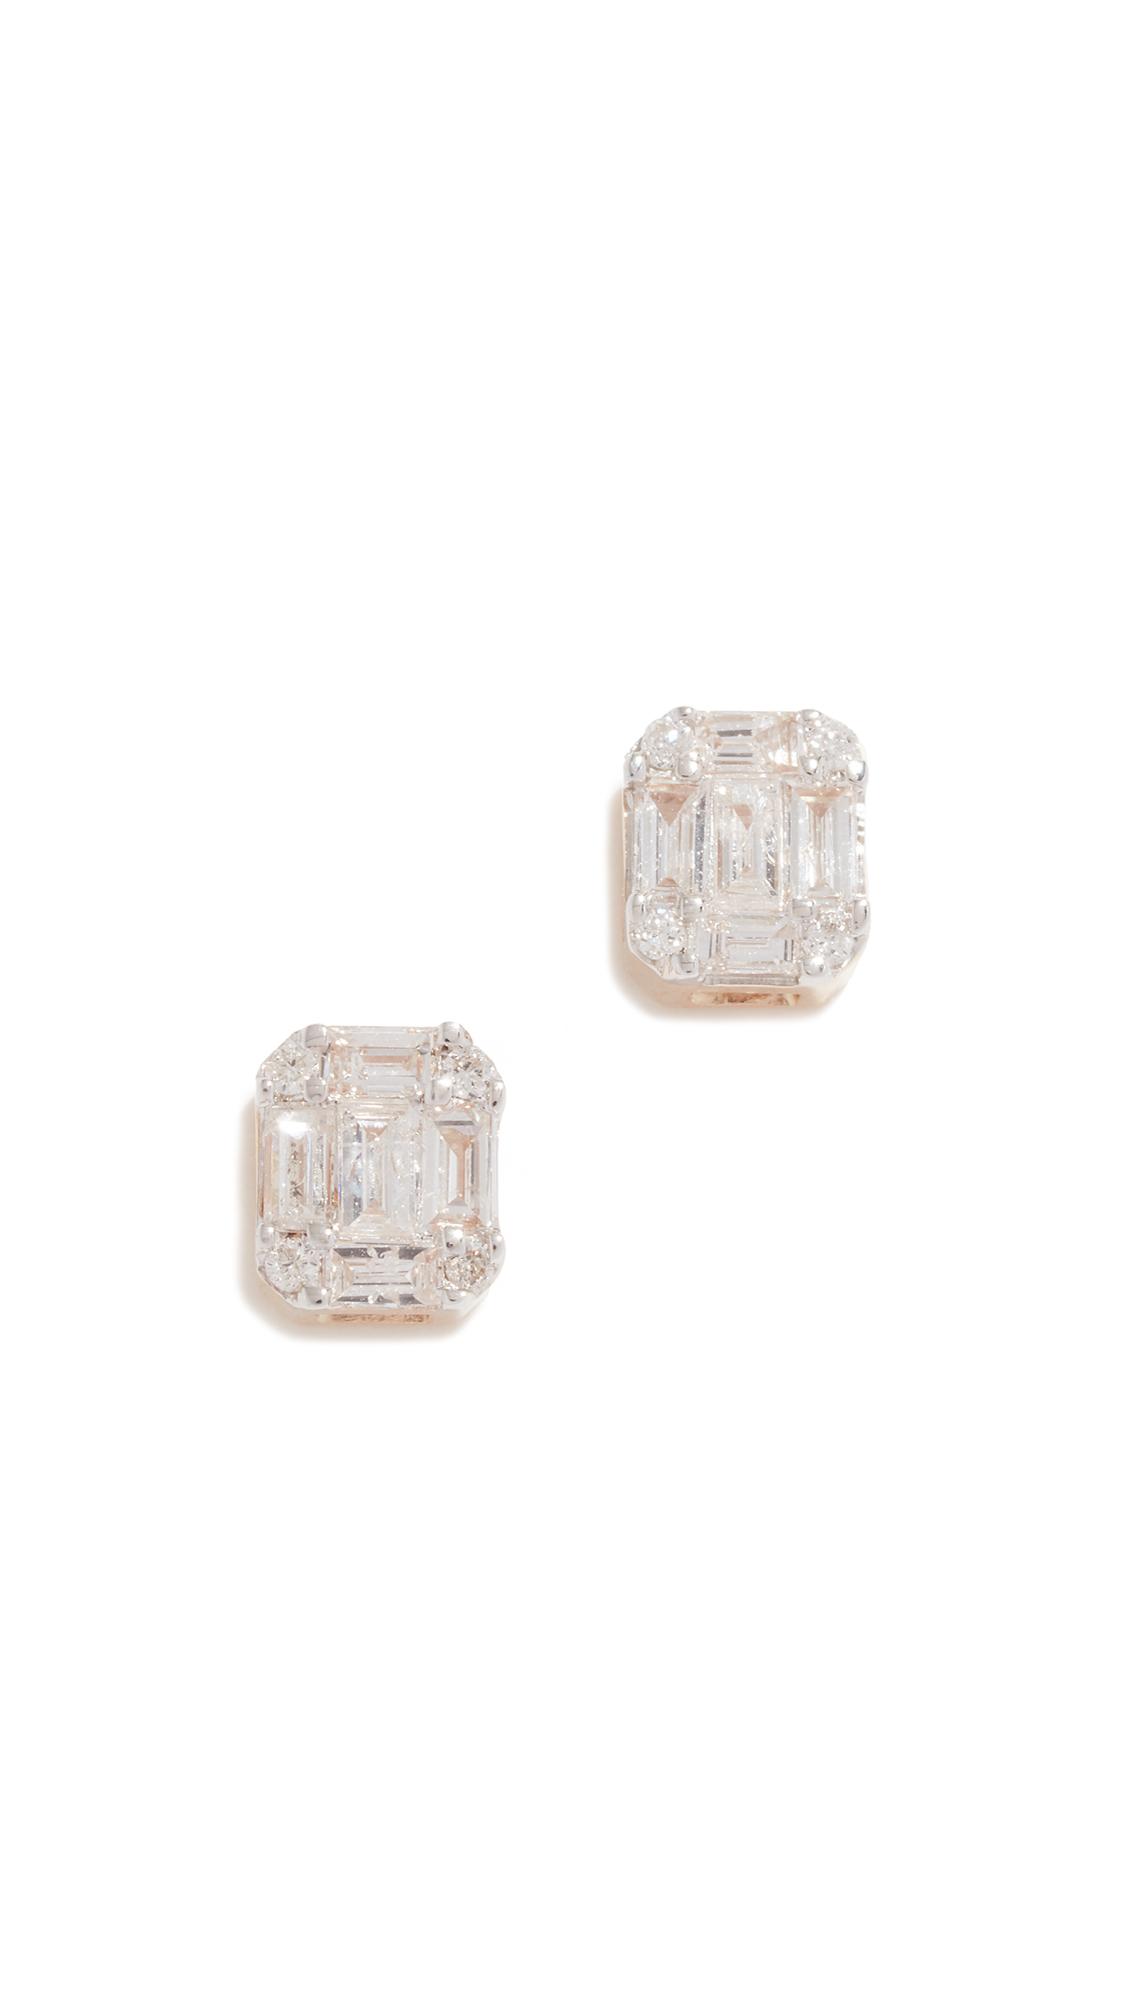 ADINA REYTER 14K Gold Diamond Baguette Stud Earrings in Yellow Gold